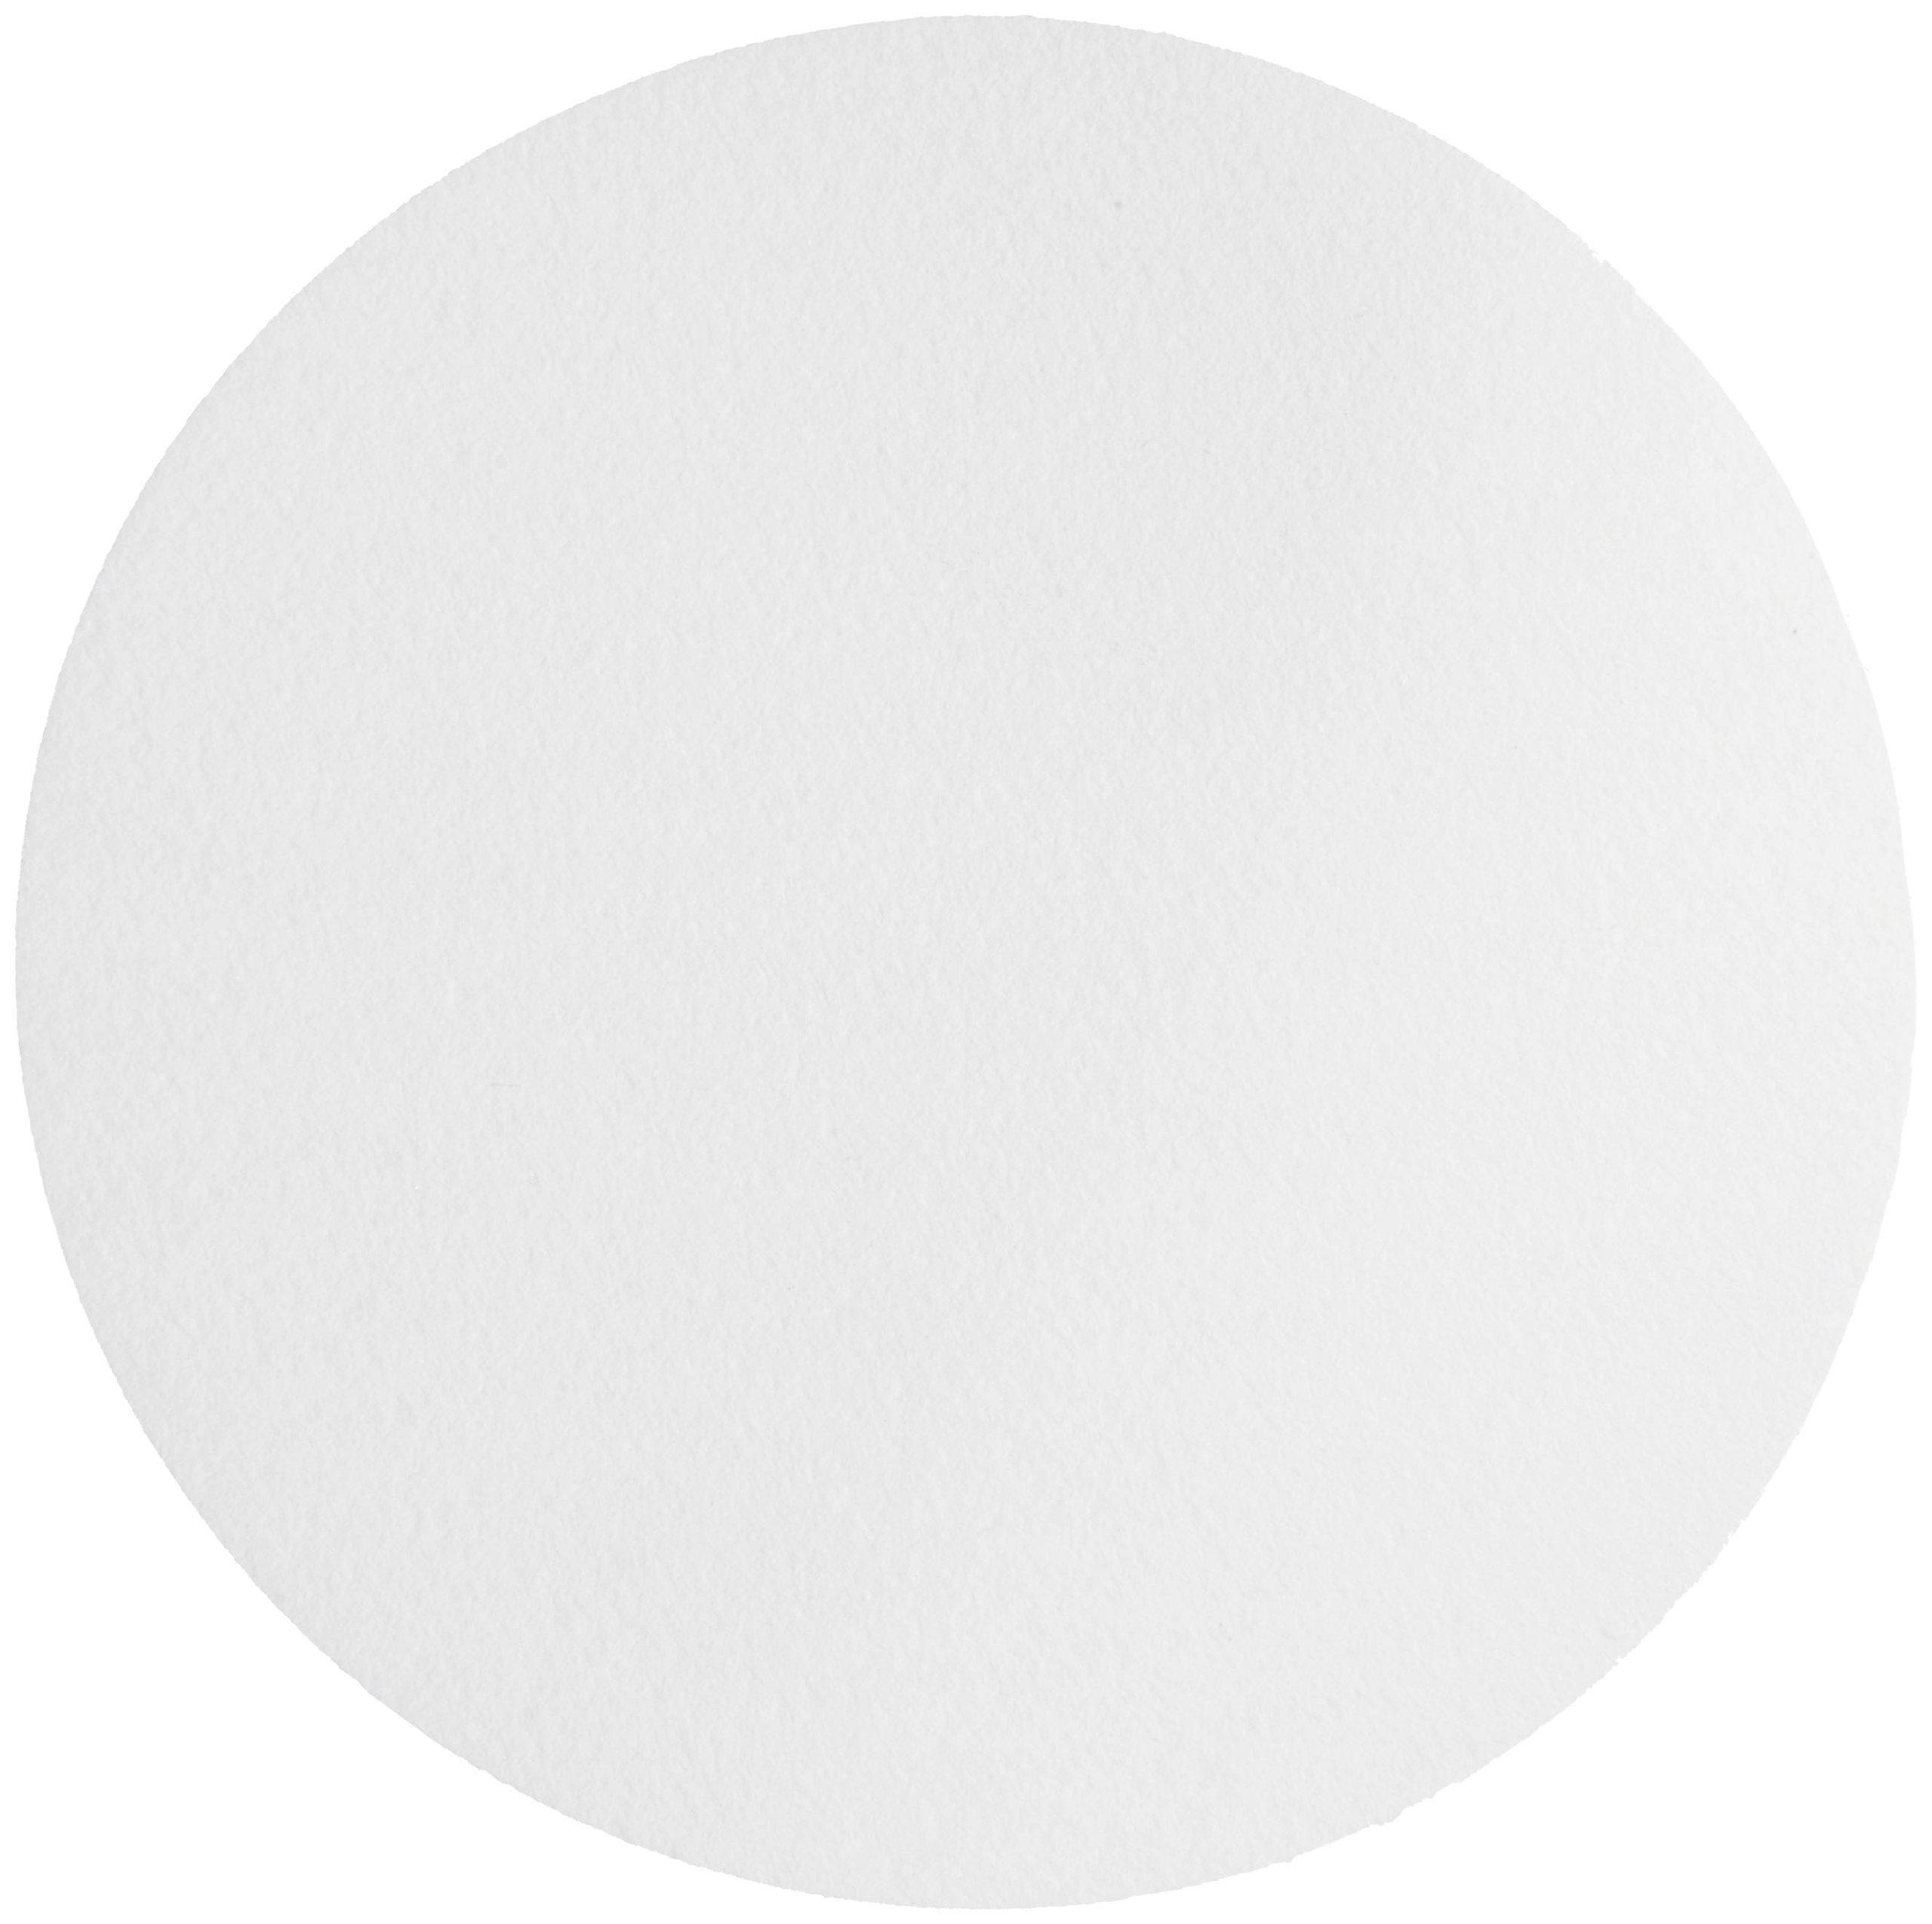 Whatman 1006-070 Quantitative Filter Paper Circles, 3 Micron, 35 s/100mL/sq inch Flow Rate, Grade 6, 70mm Diameter (Pack of 100) by Whatman